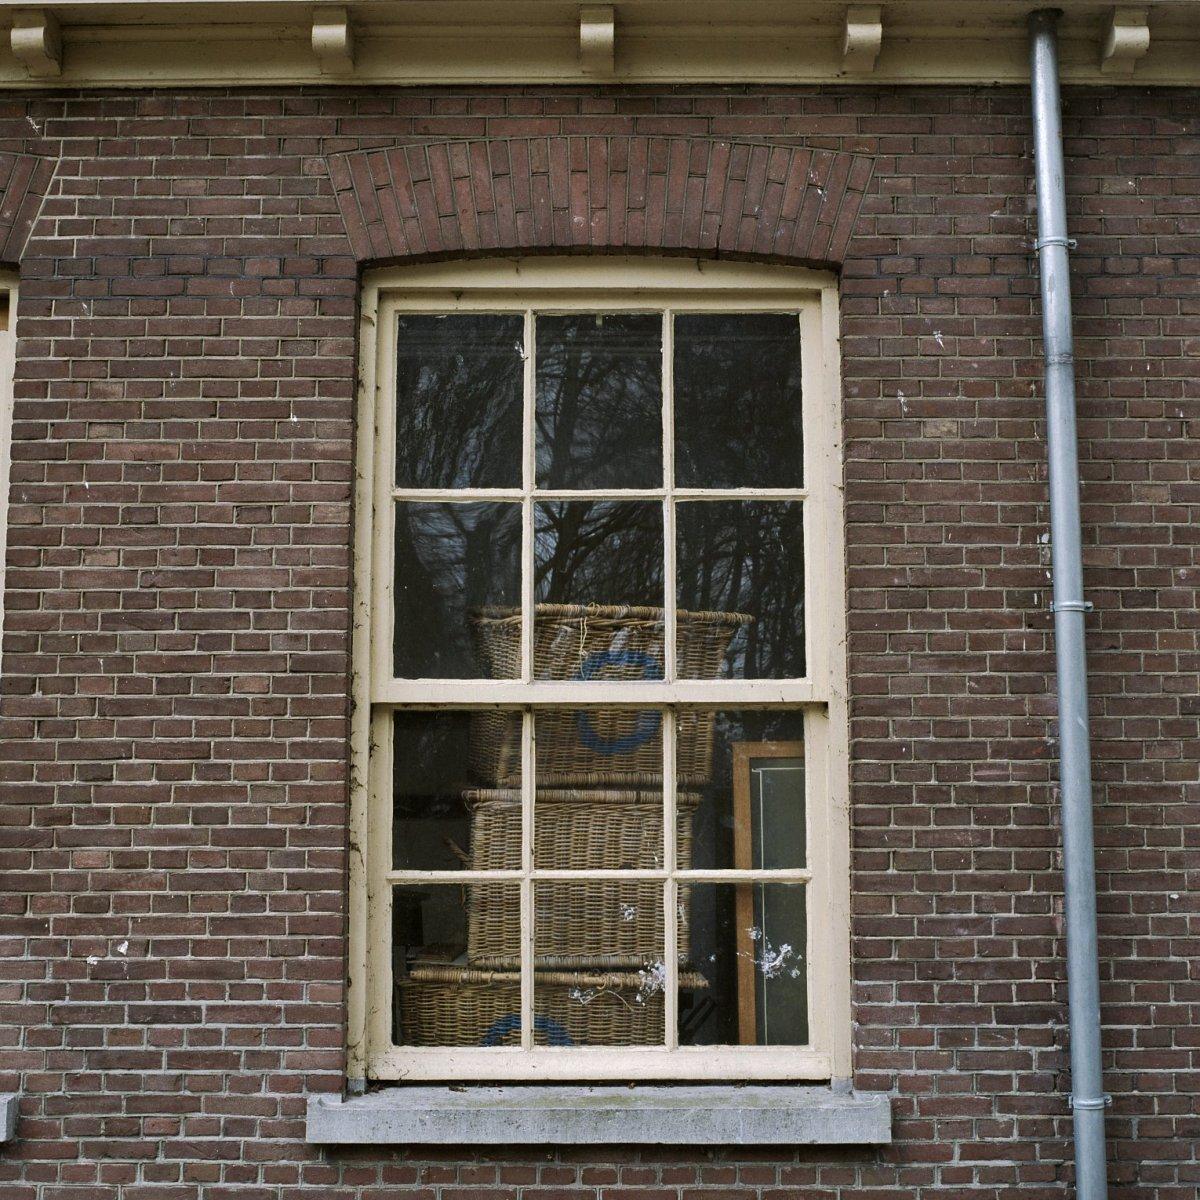 Hospitaal 2 hospitaal centrale keuken in veenhuizen for Open venster rotterdam